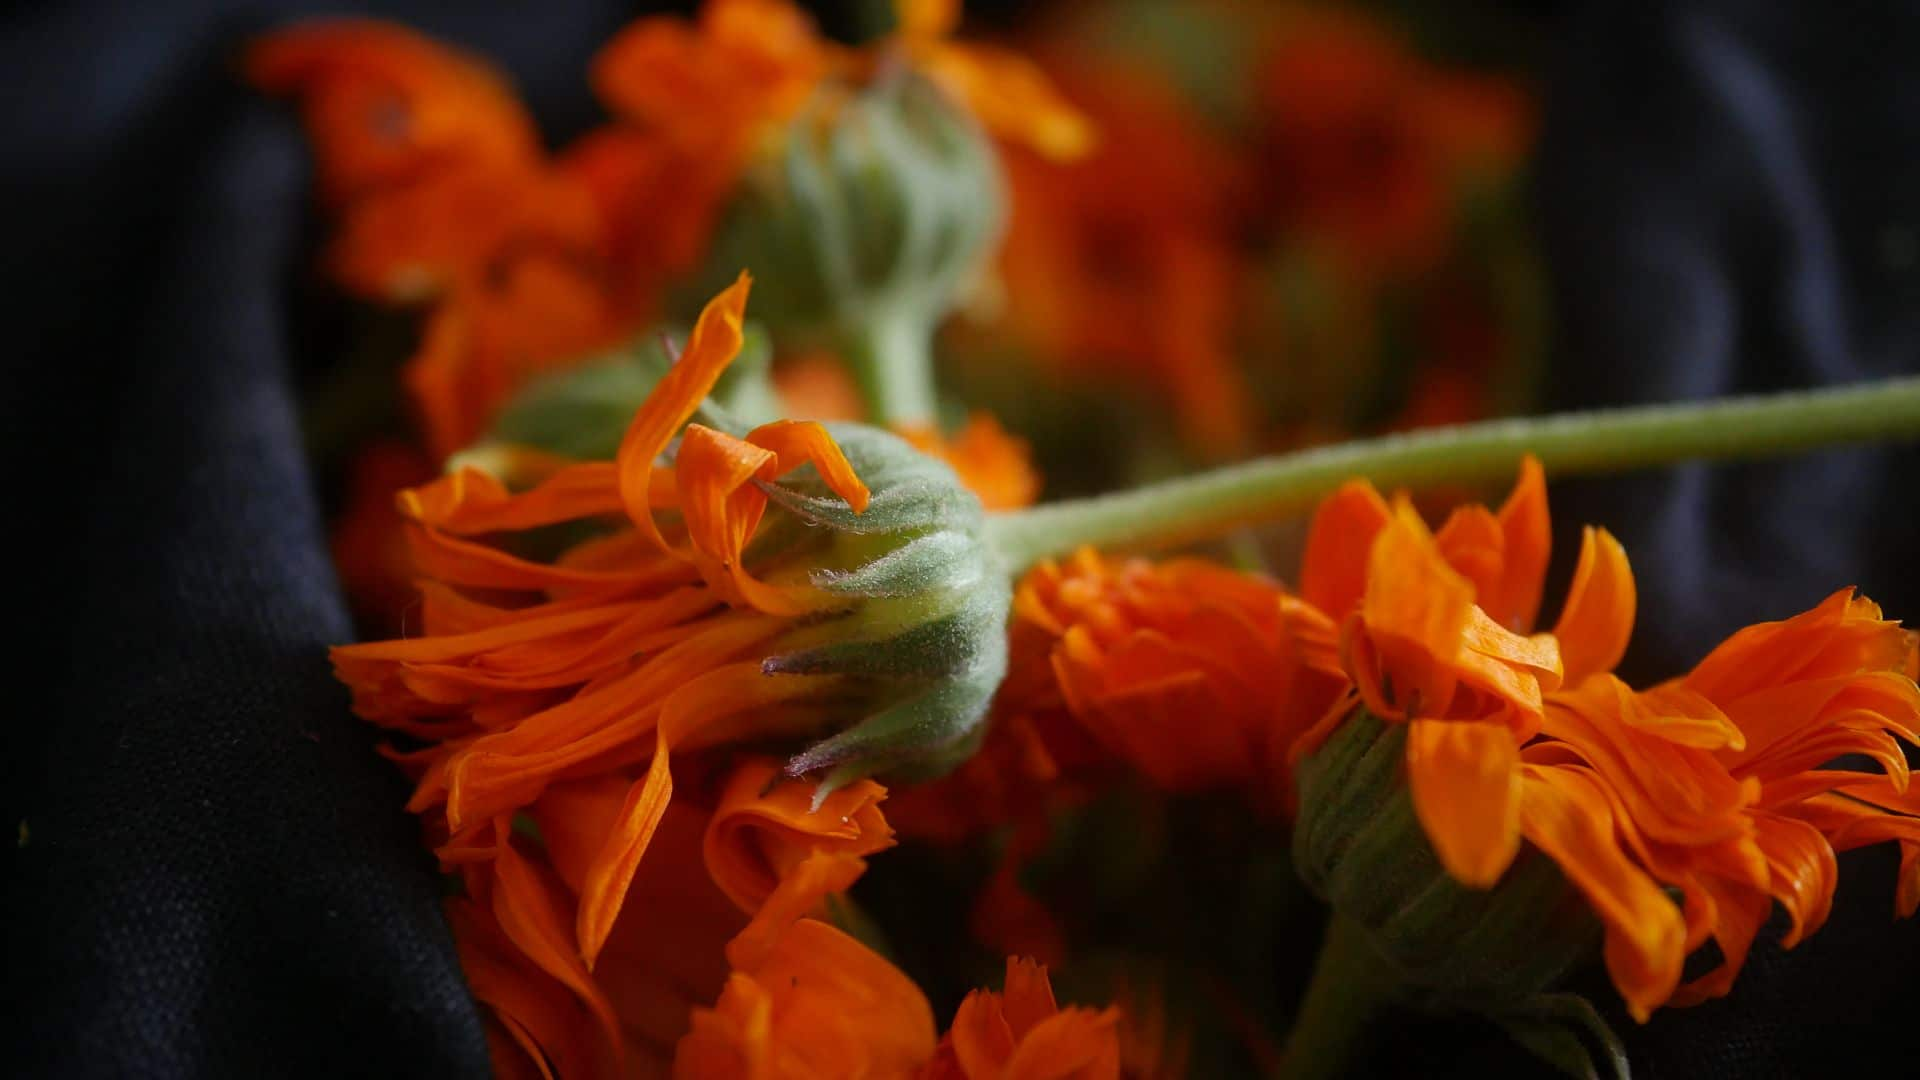 Ringelblumentinktur Calendula tinktur Ringelblumenblüte Ringelblumen Garten Ringelblumen bei Hautentzündungen Ringelblumen pflanzen Ringelblumen zur aüßerlichen Anwendung Ringelblumen tinktur Calendulatinktur Ringelblumenblätter Ringelblumen im Garten